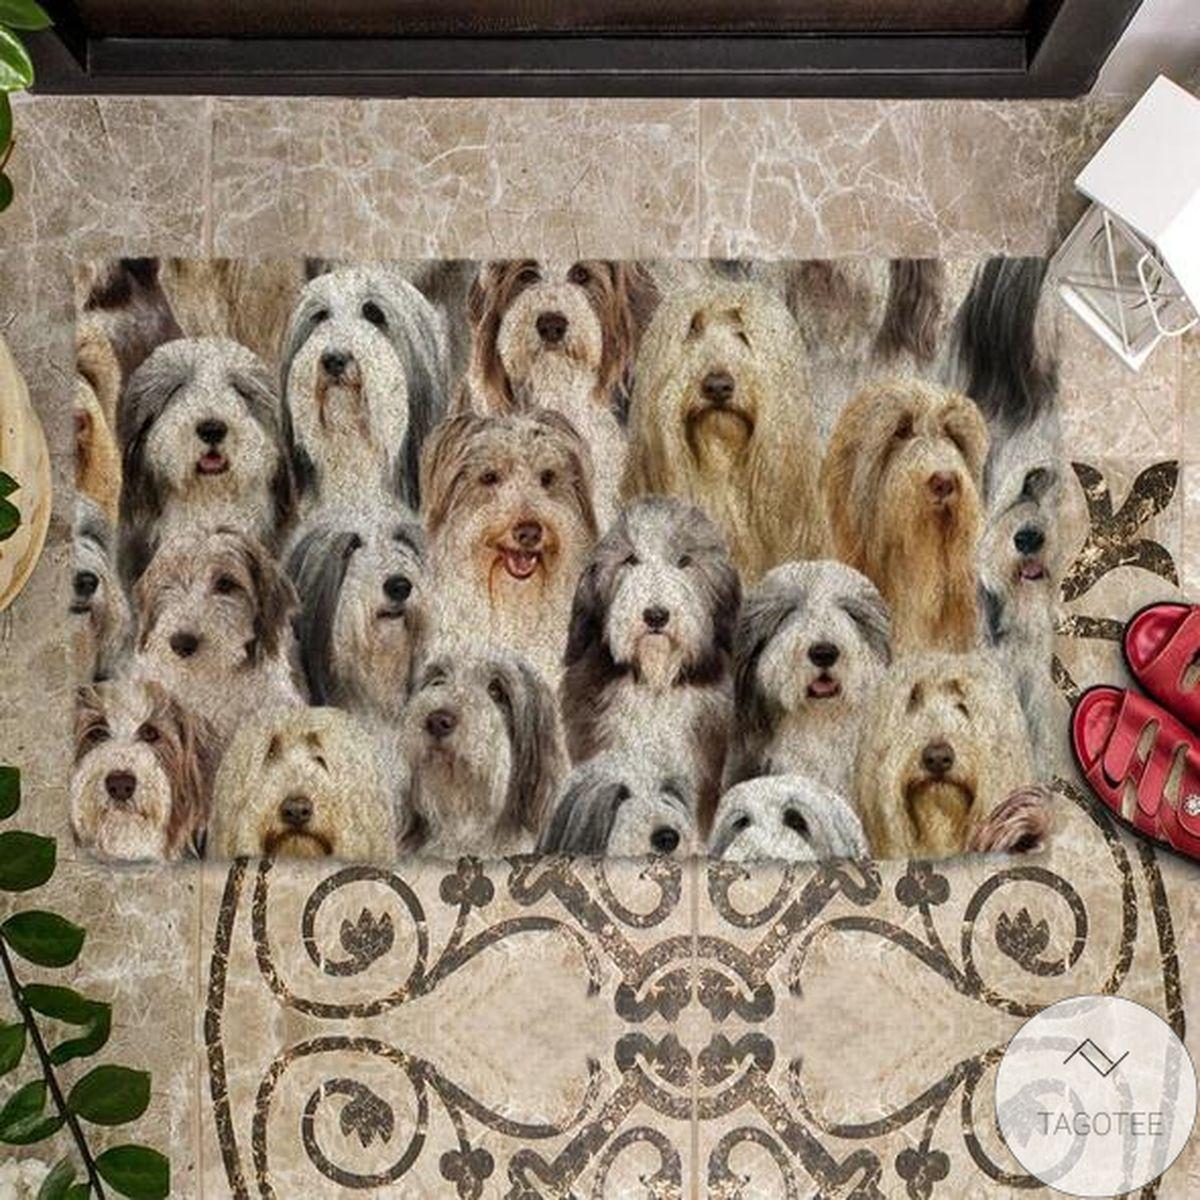 Hot A Bunch Of Bearded Collies Doormat